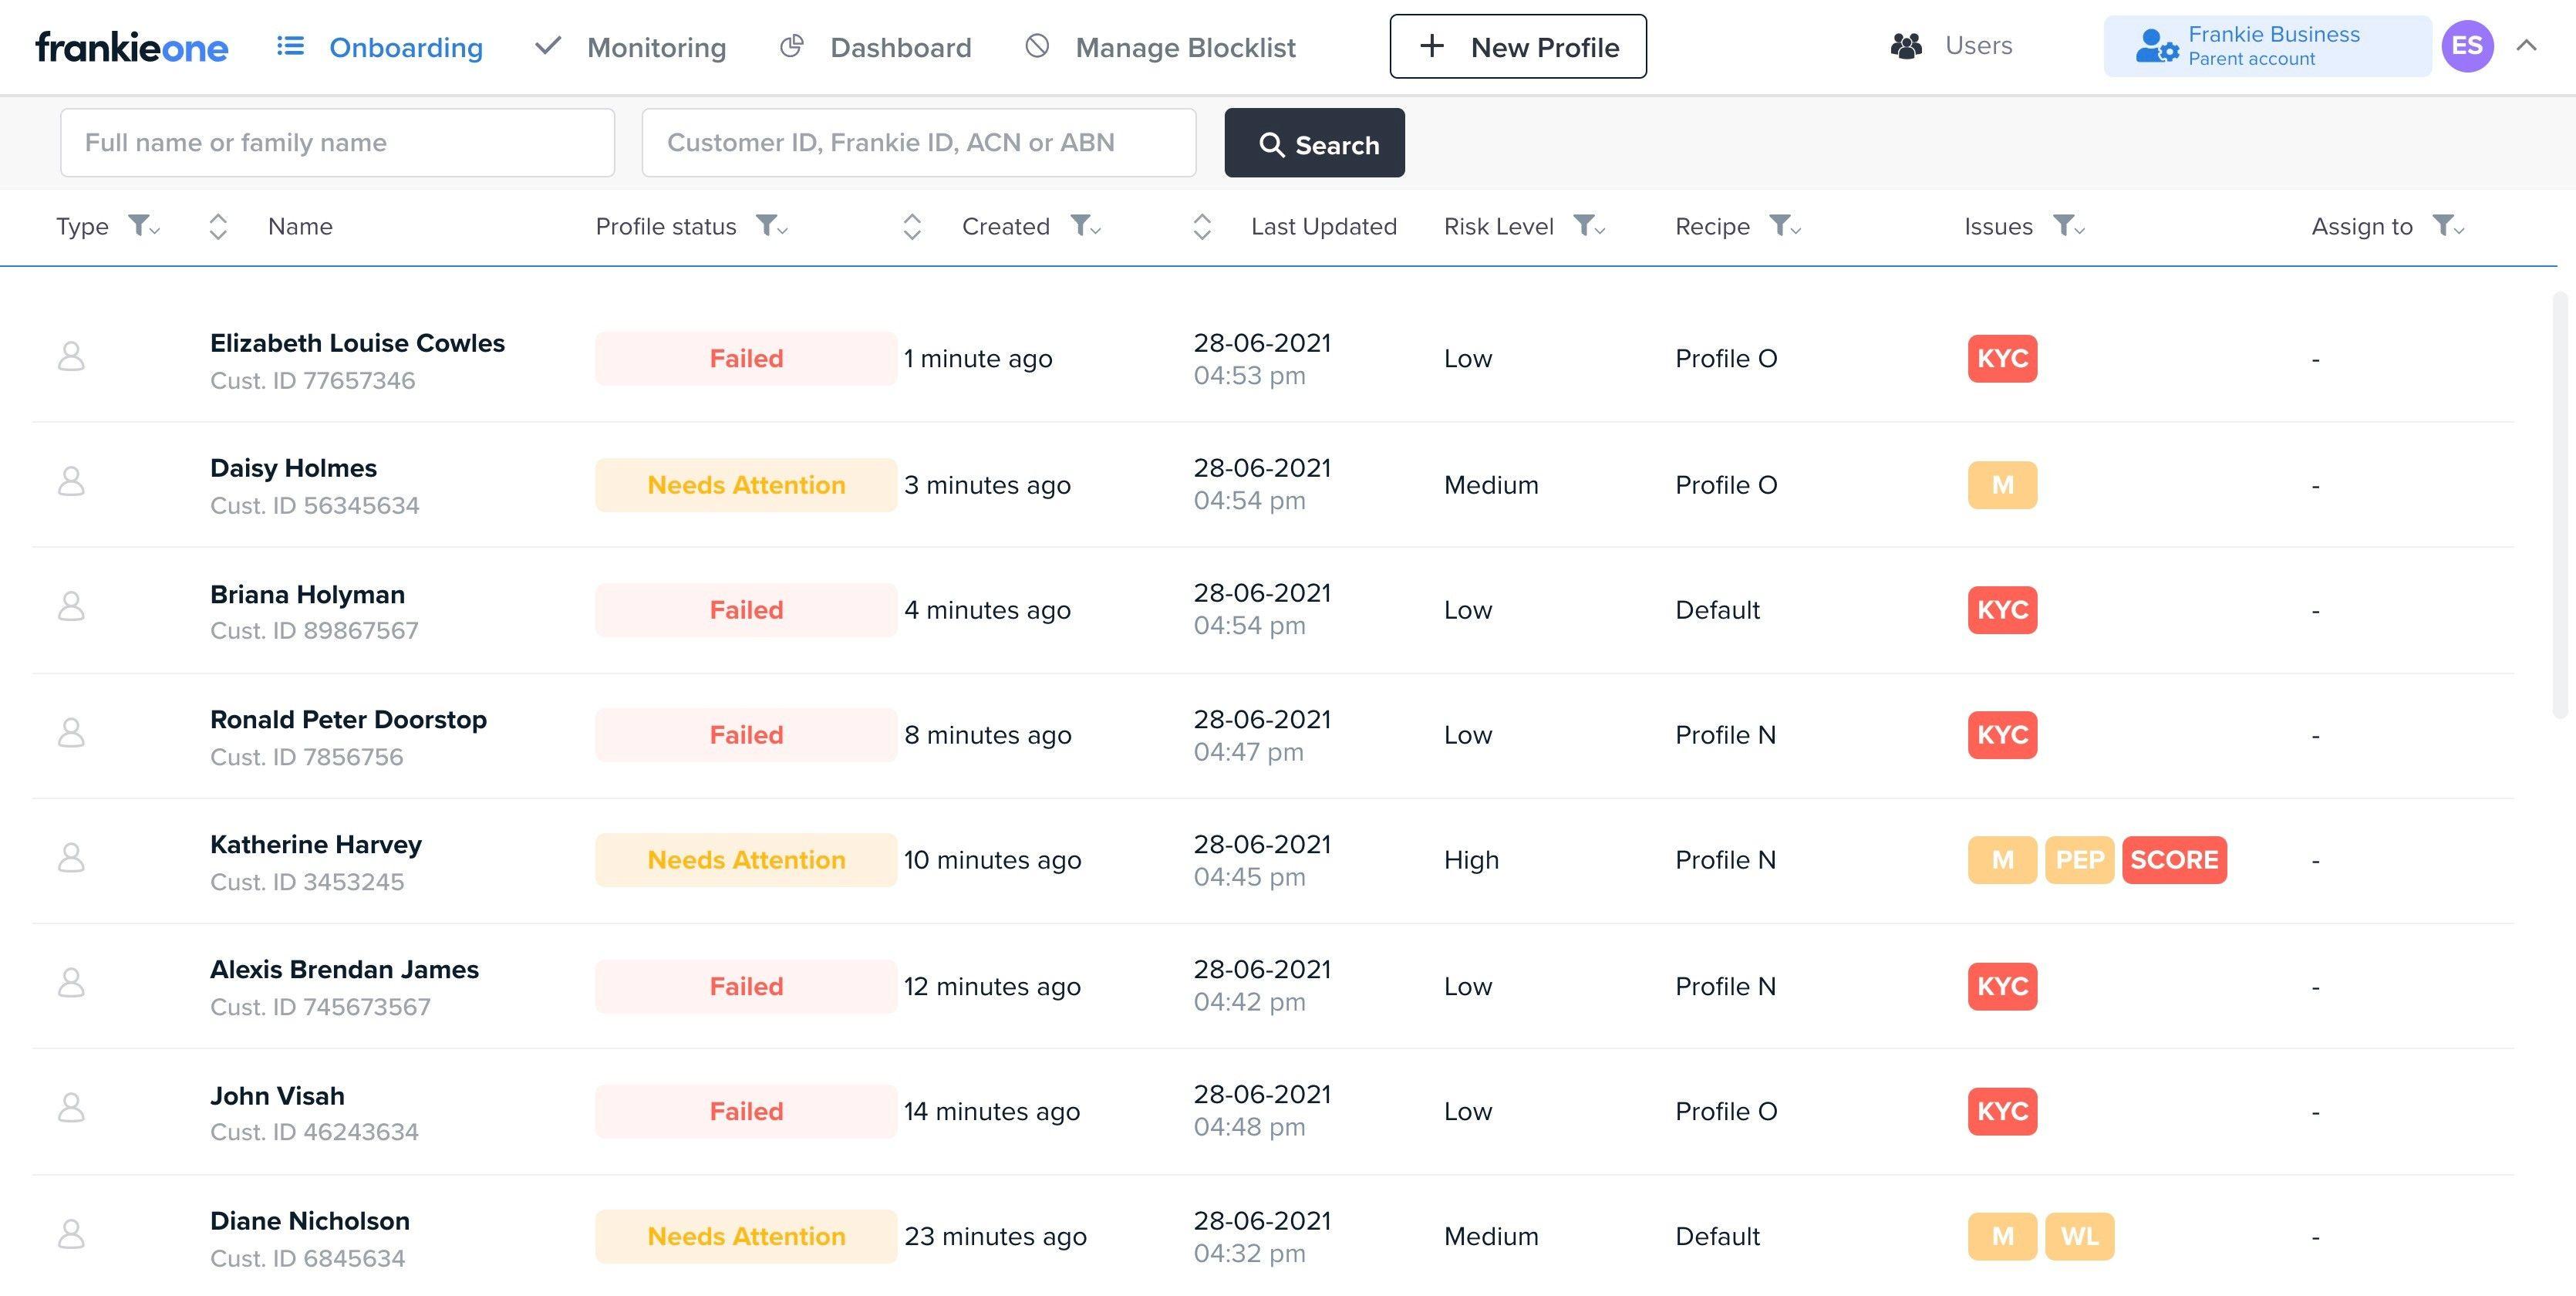 Screenshot of the onboarding list